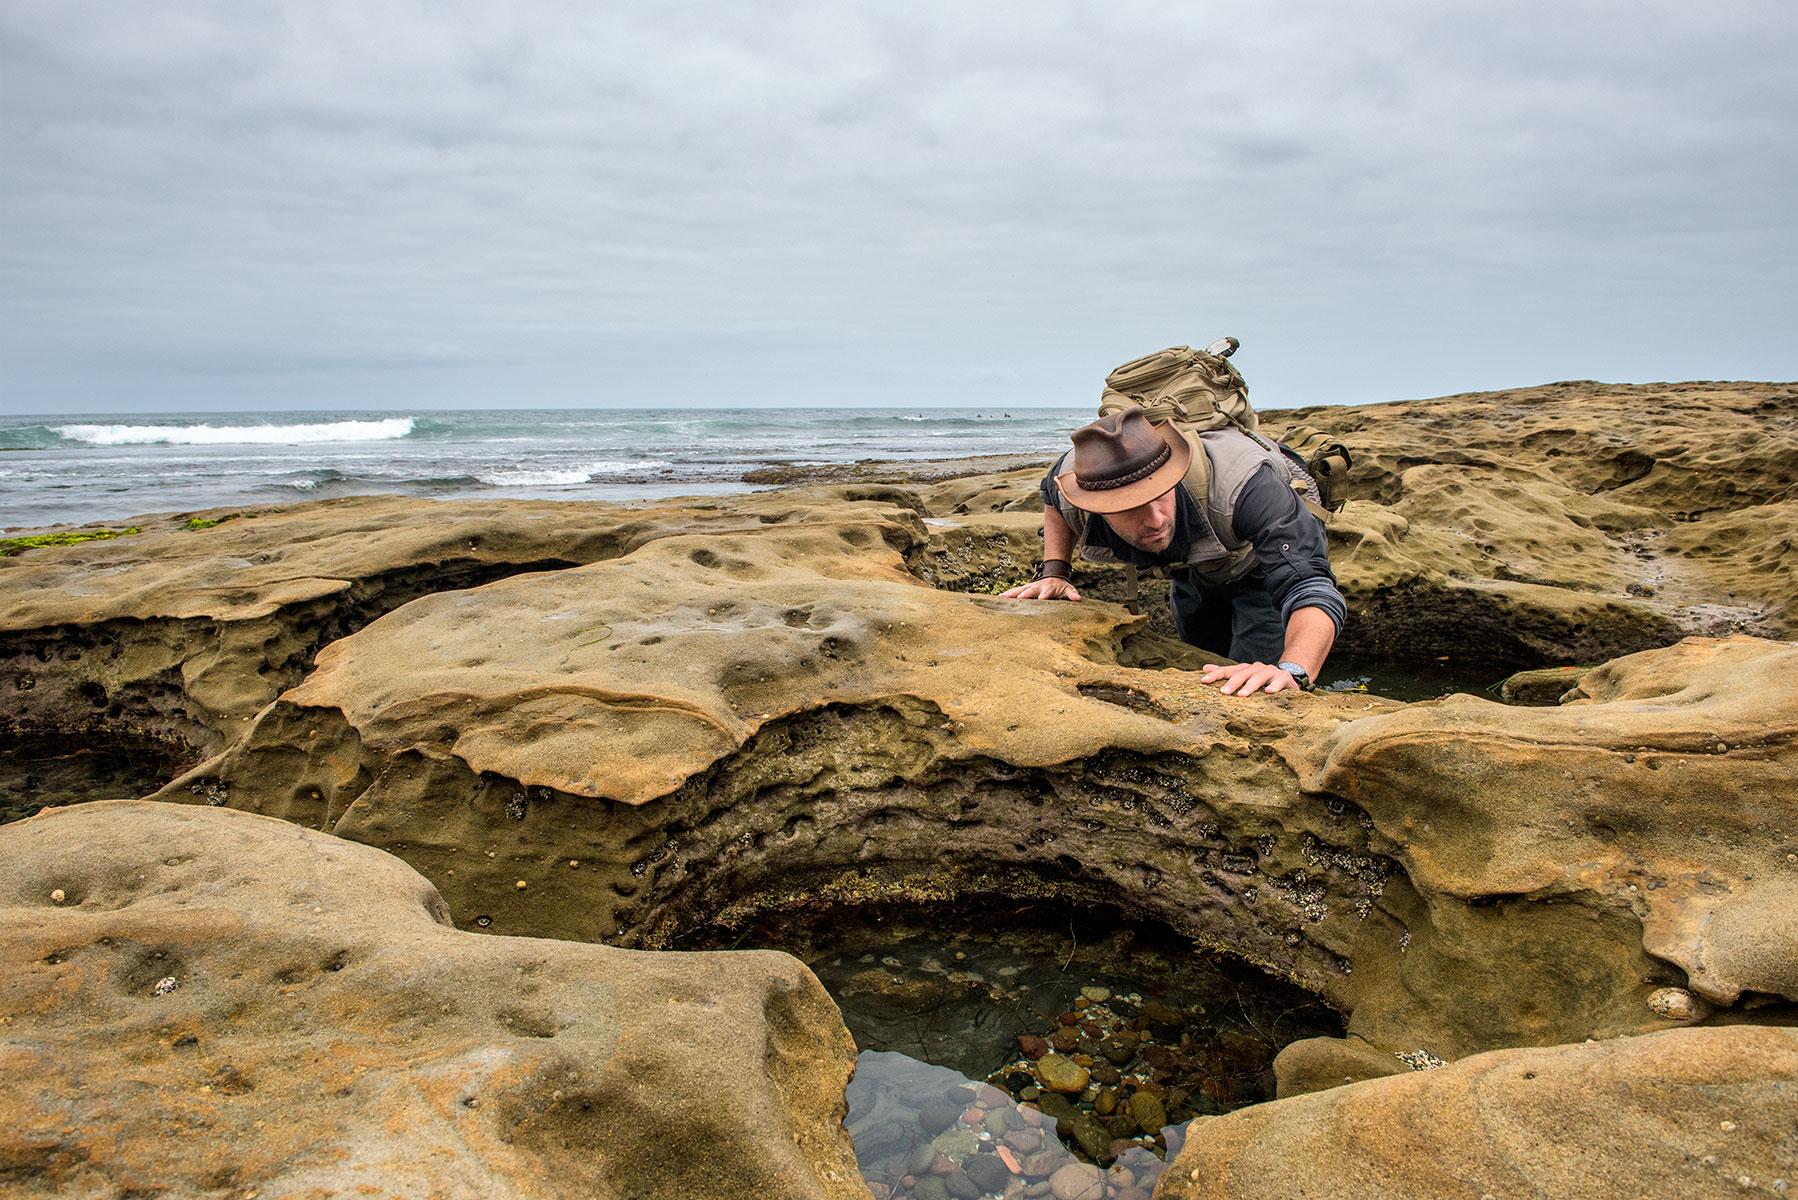 austin-trigg-brave-wilderness-la-jolla-california-reef-search-hunt.jpg